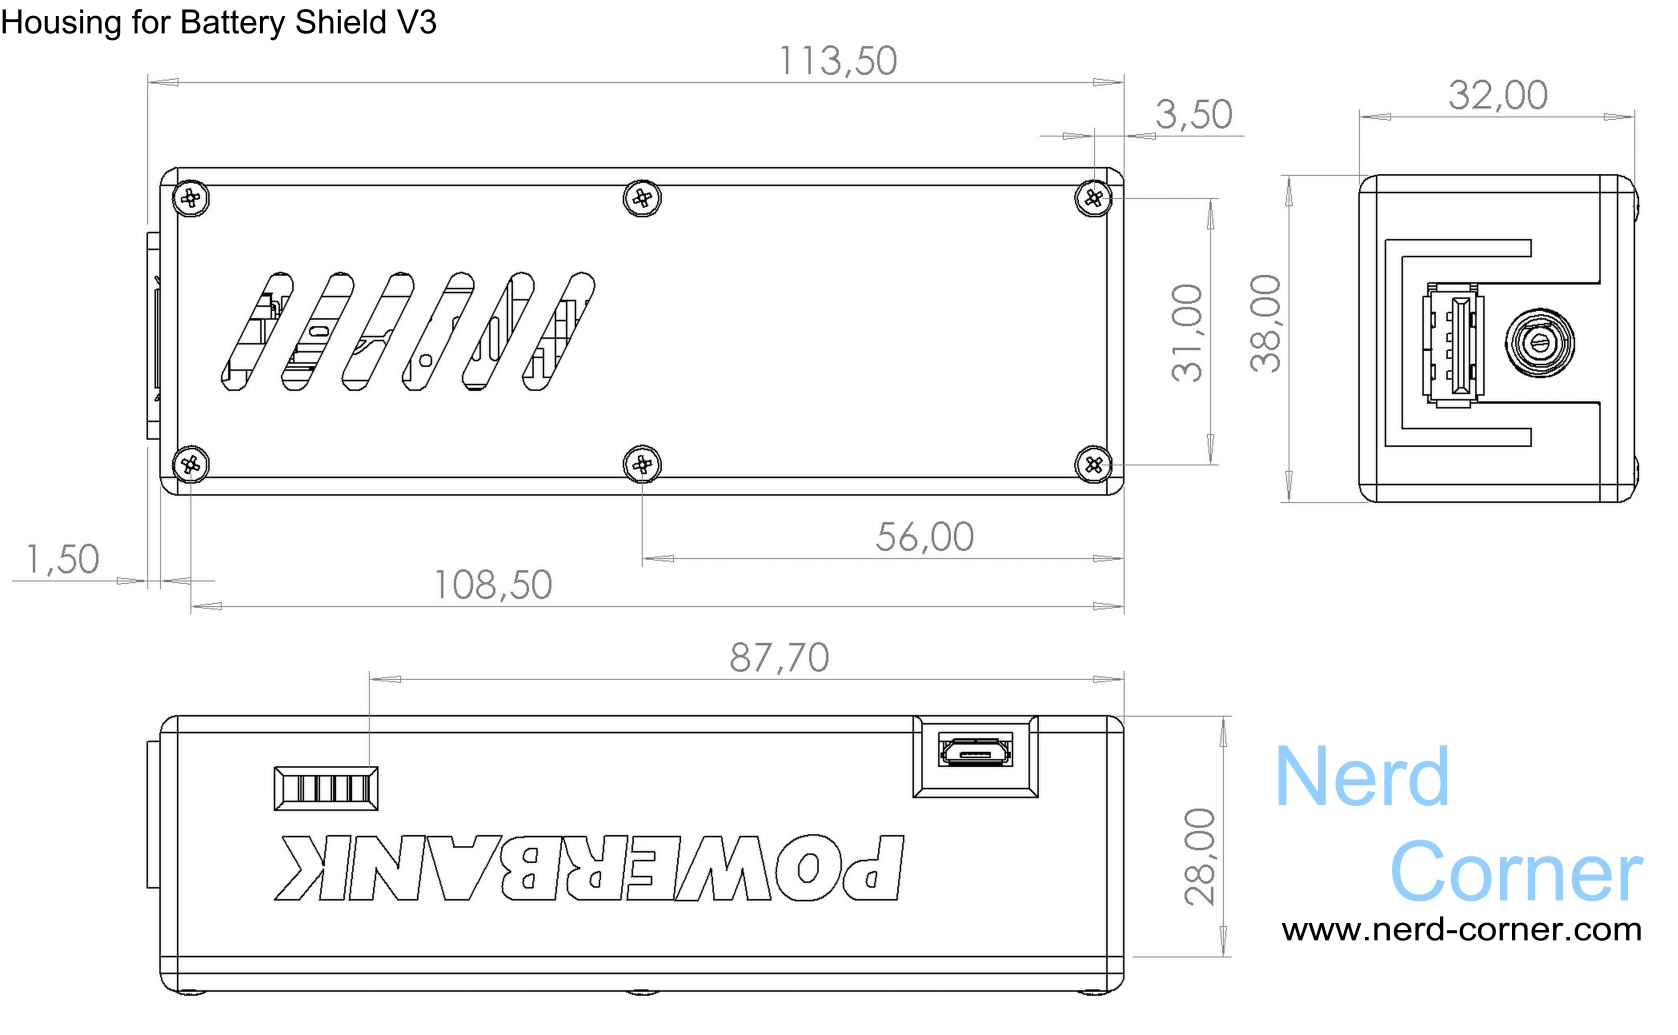 Abmessungen battery shield v3